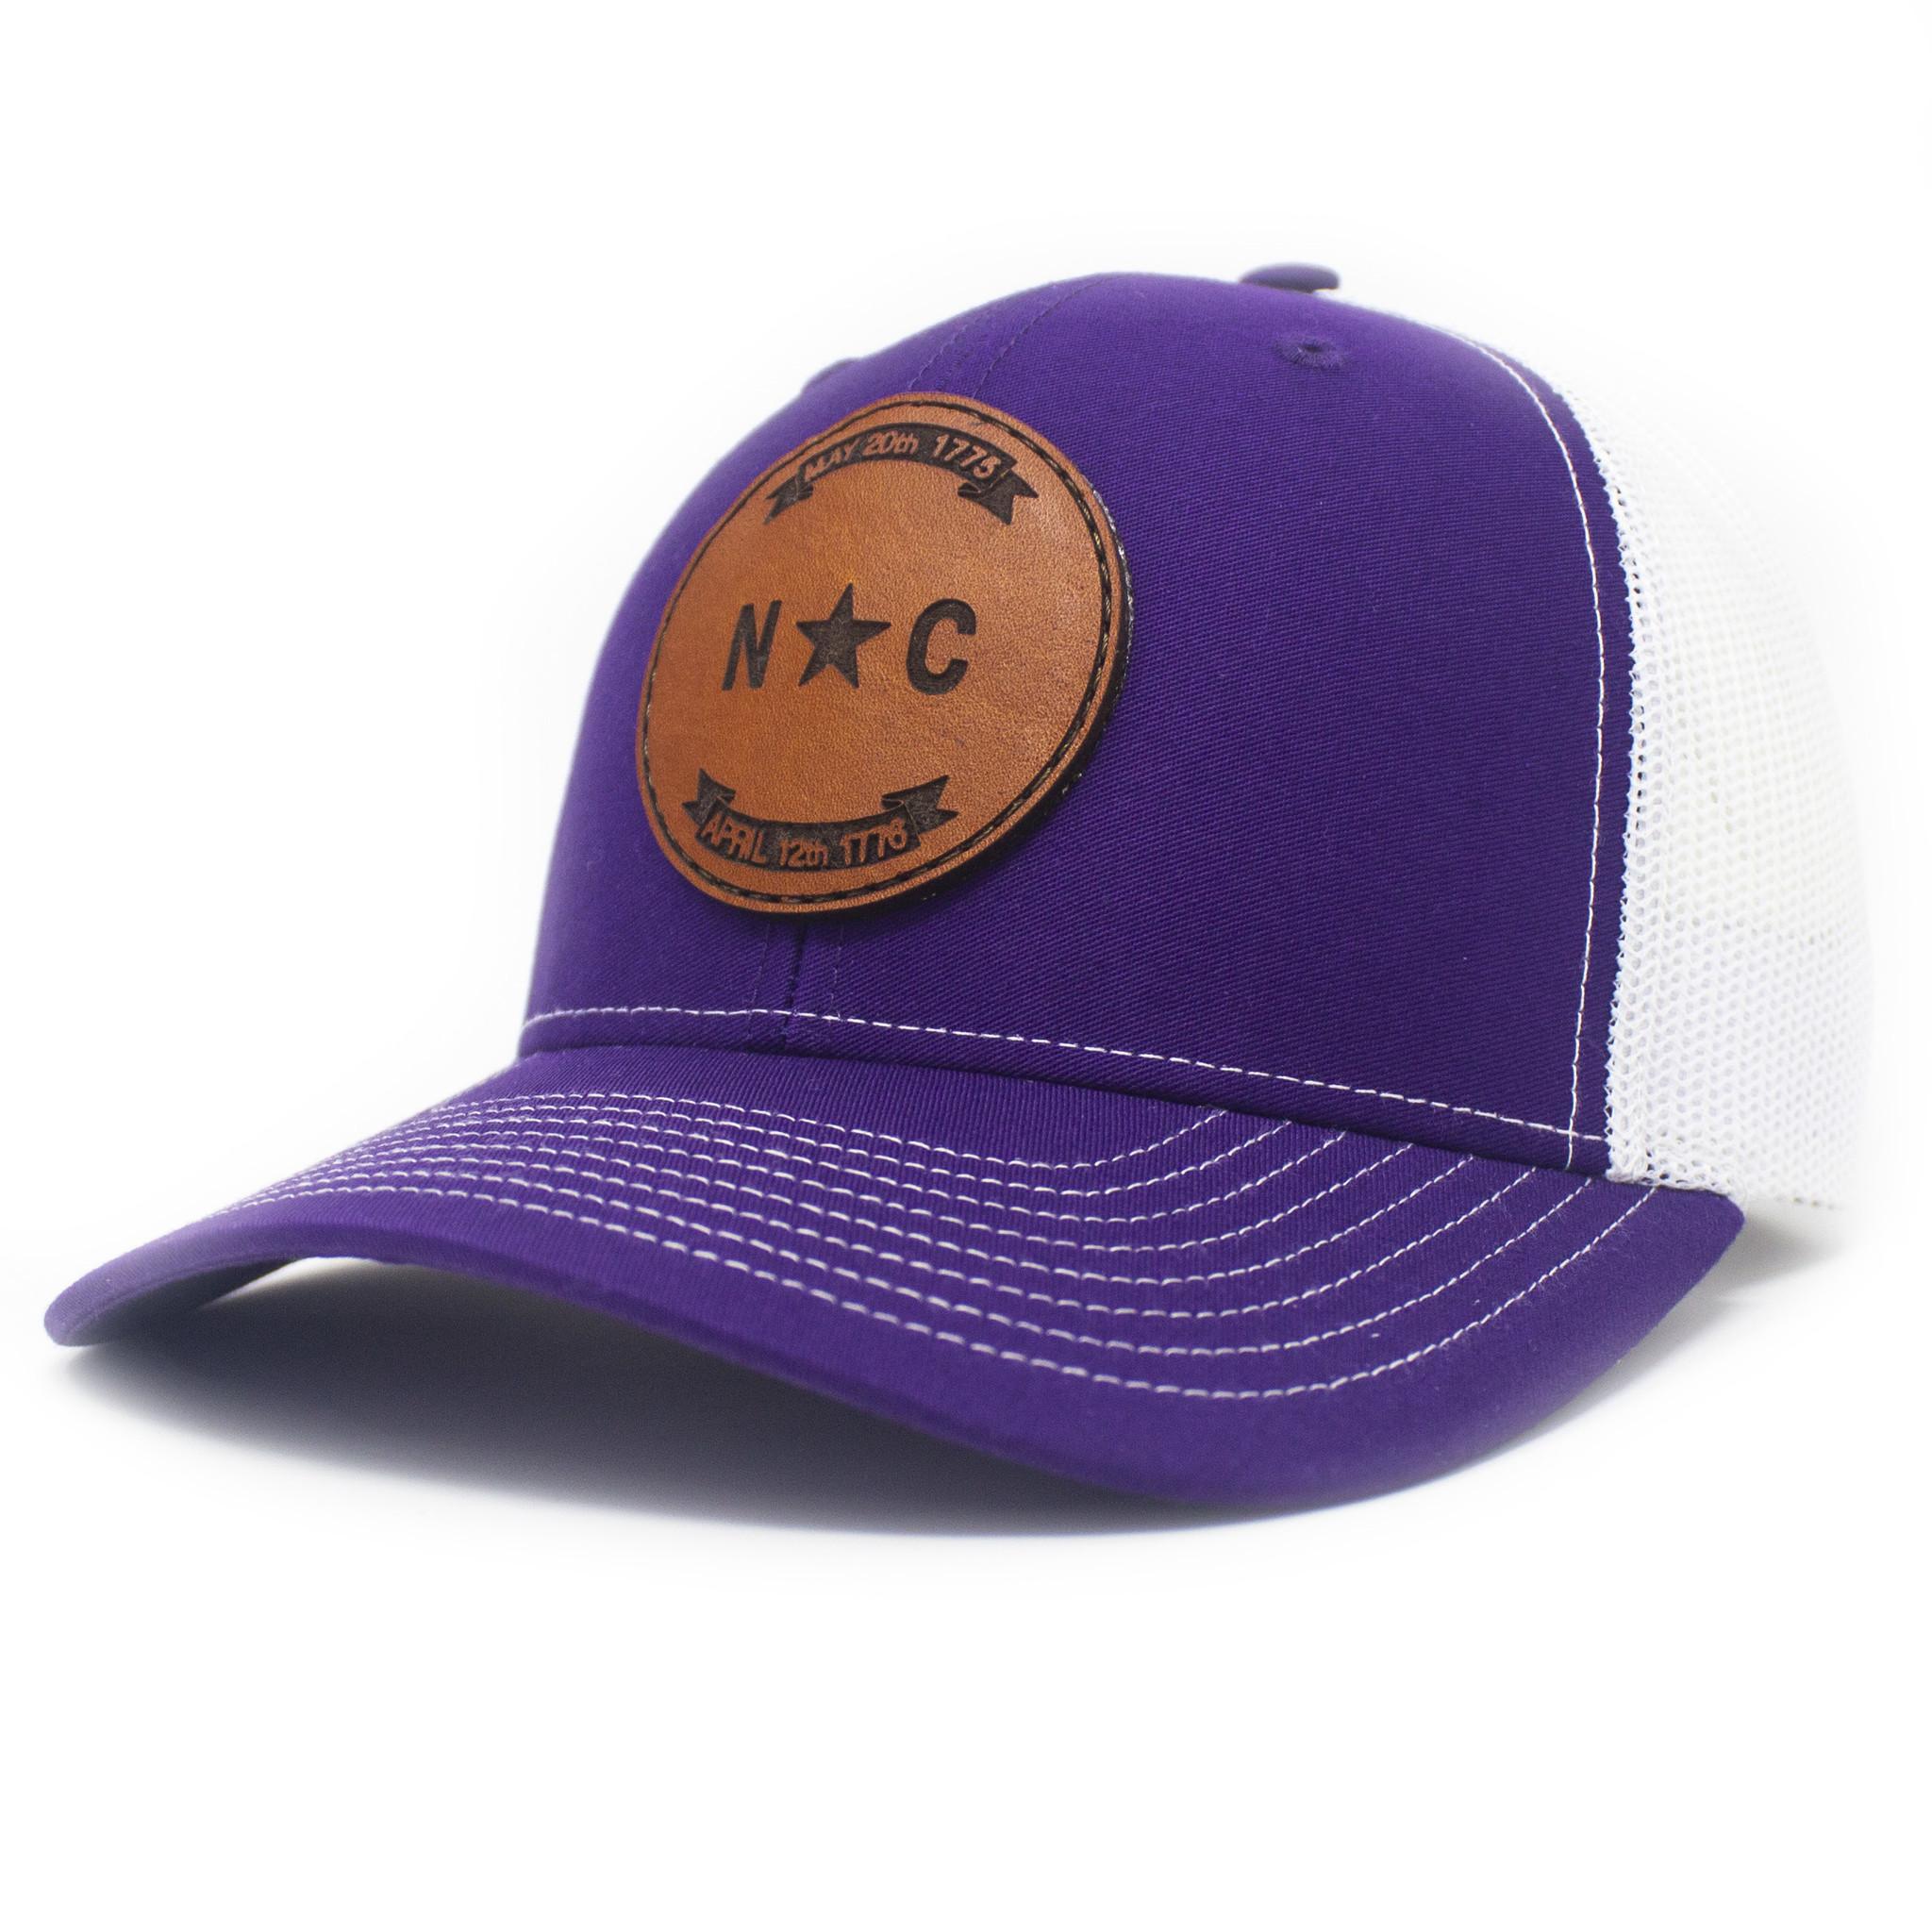 North Carolina Leather Patch Trucker Hat Purple/White-1